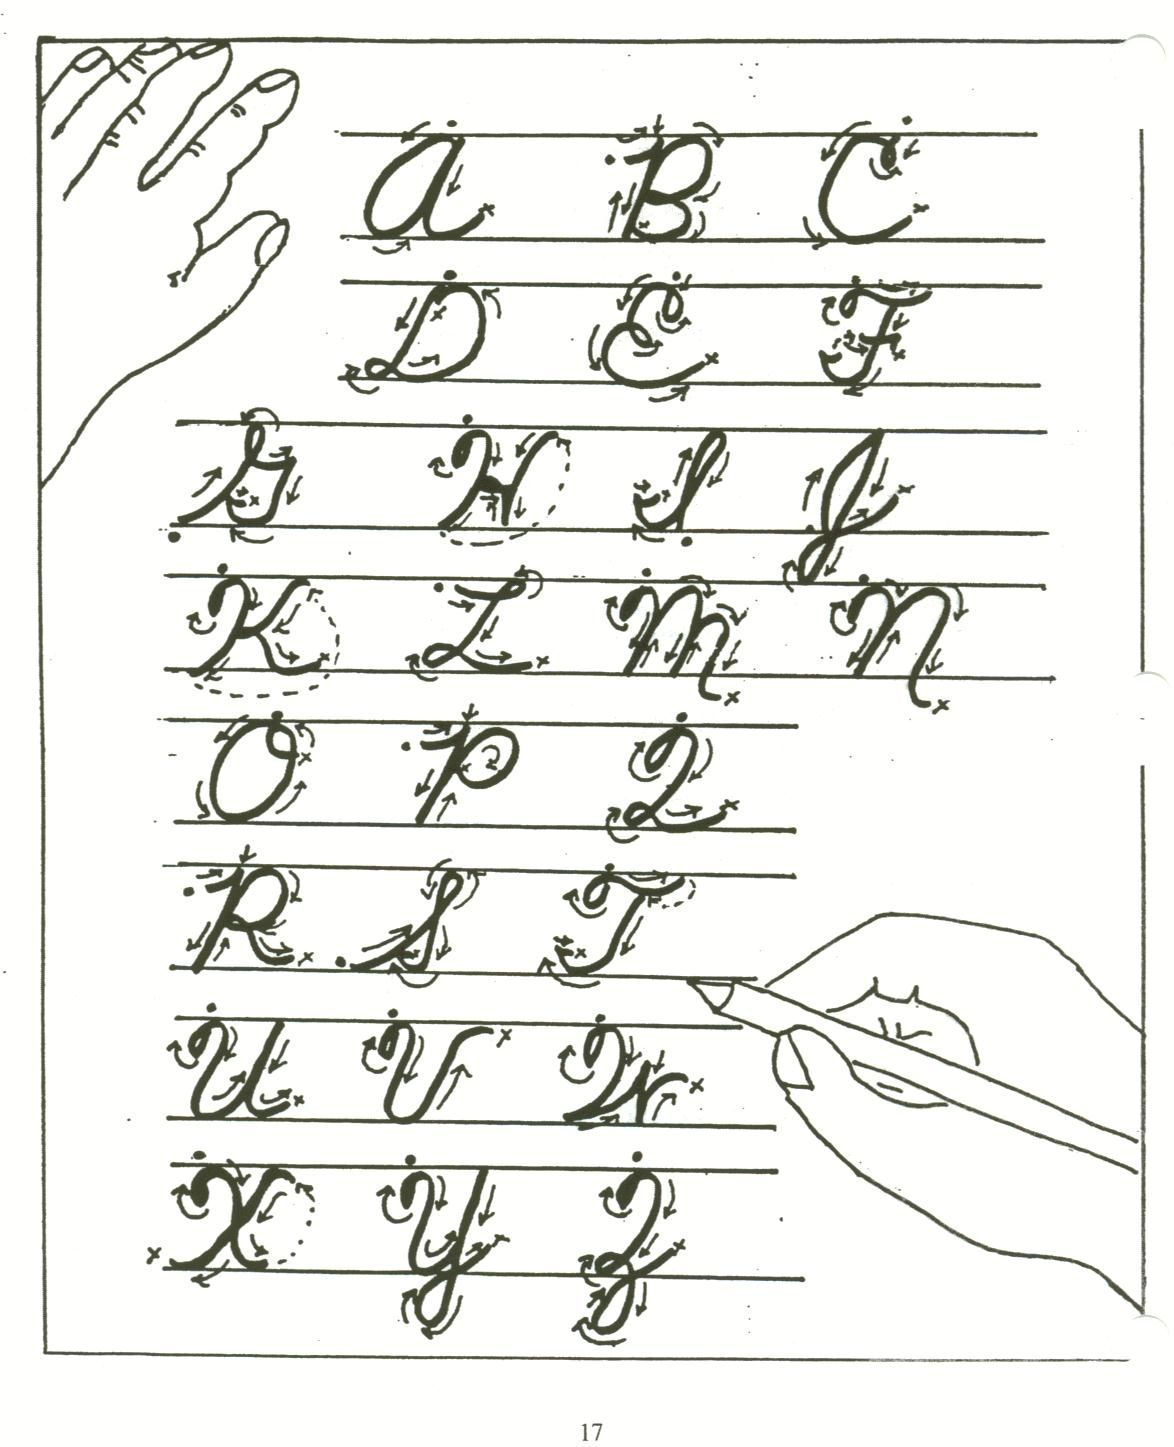 Handwriting Cursive Alphabet   Learning cursive [ 1447 x 1174 Pixel ]